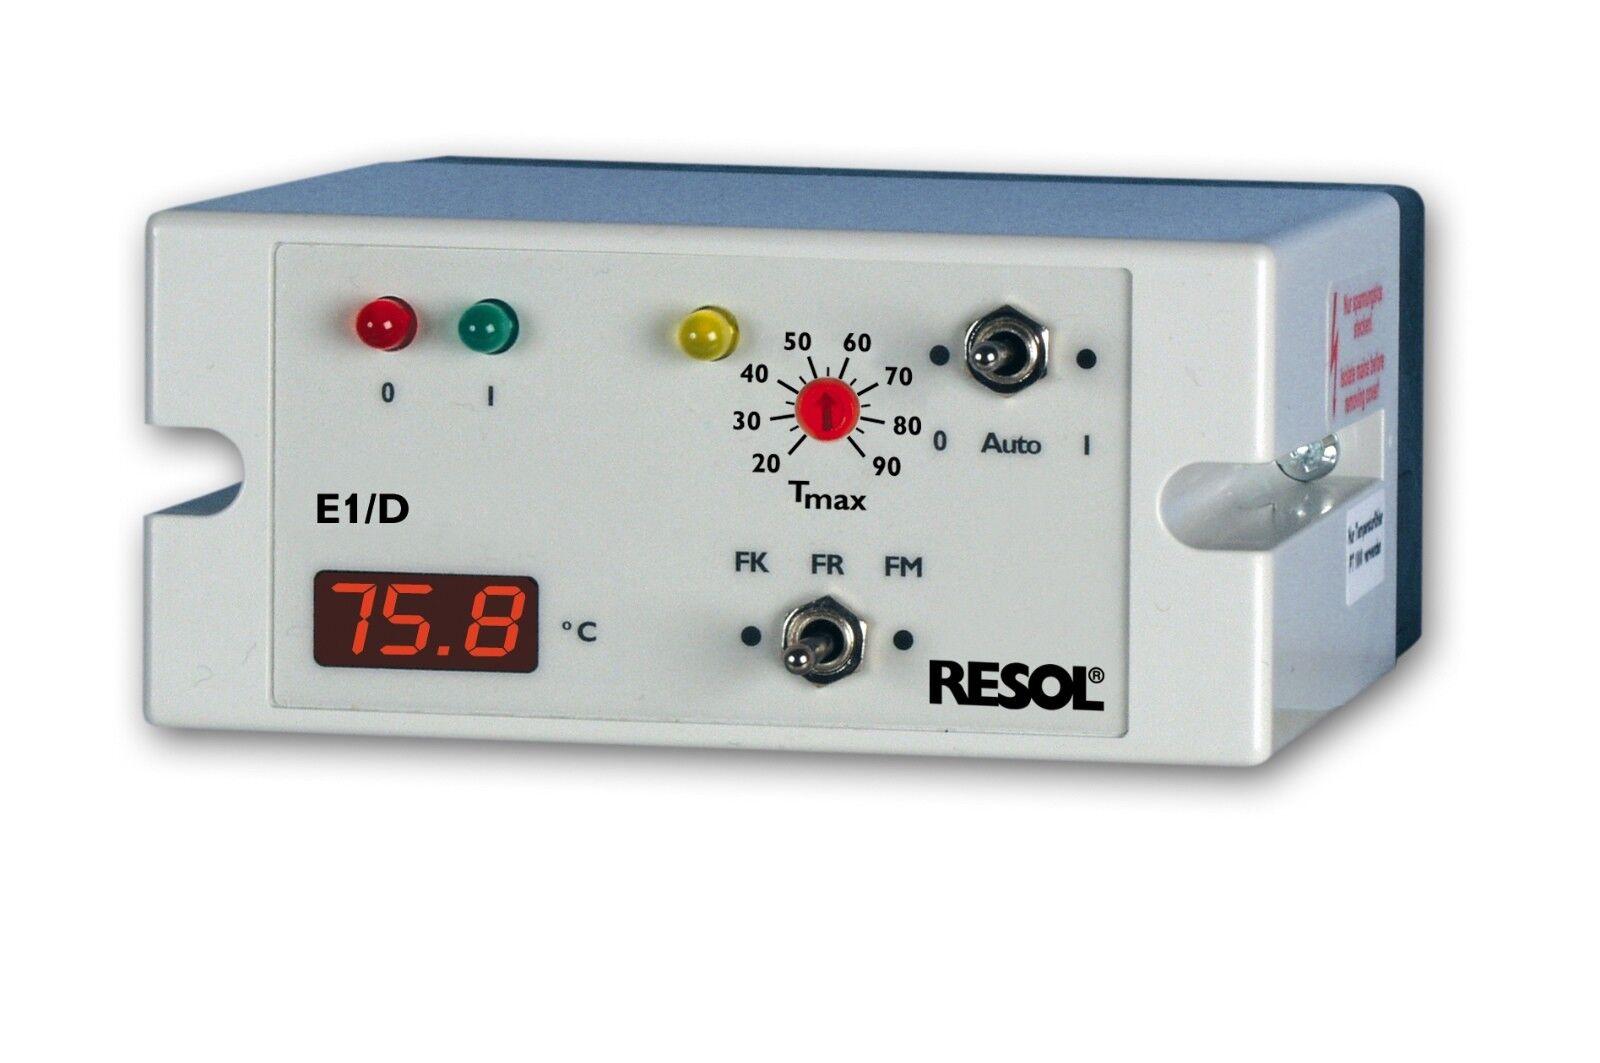 RESOL E1 D Temperaturdiffenrenzregler inkl. 3 Pt1000 Sensoren